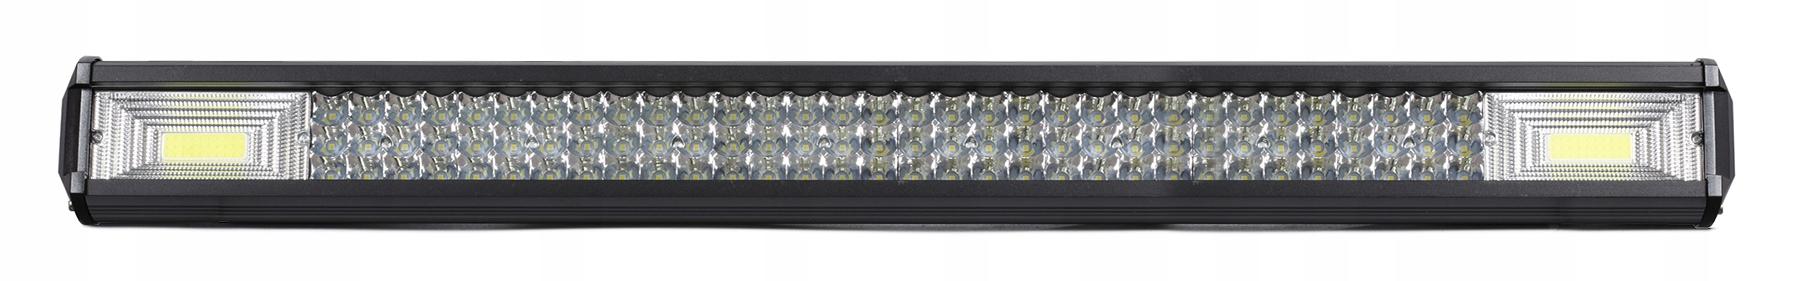 LED COB 432W HALOGEN SZPERACZ LAMPA ROBOCZA 12-24V EAN 5903726624633